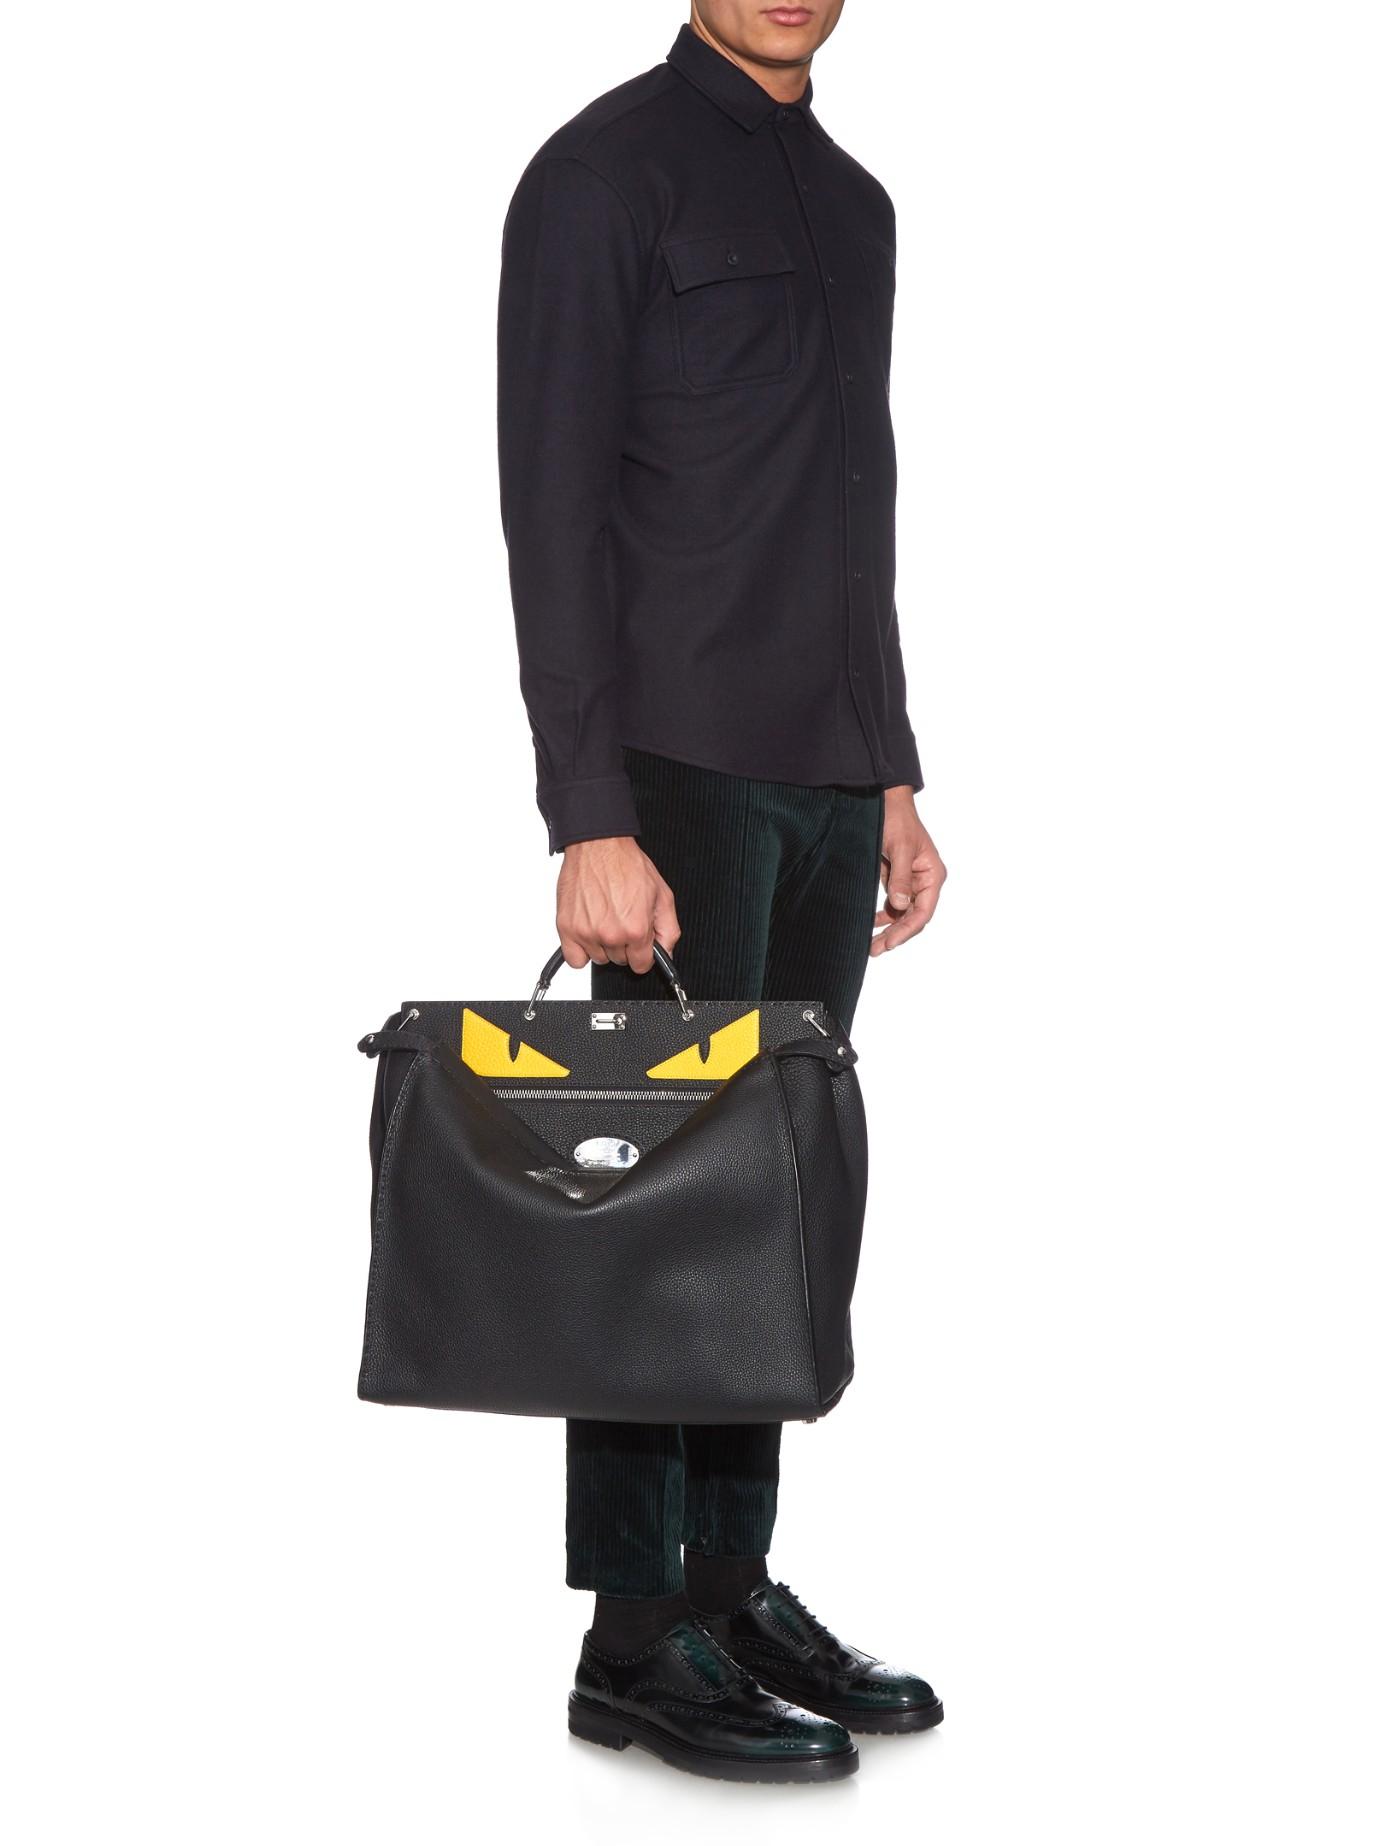 3152f9d9c7 Lyst - Fendi Selleria Peekaboo Leather Tote in Black for Men